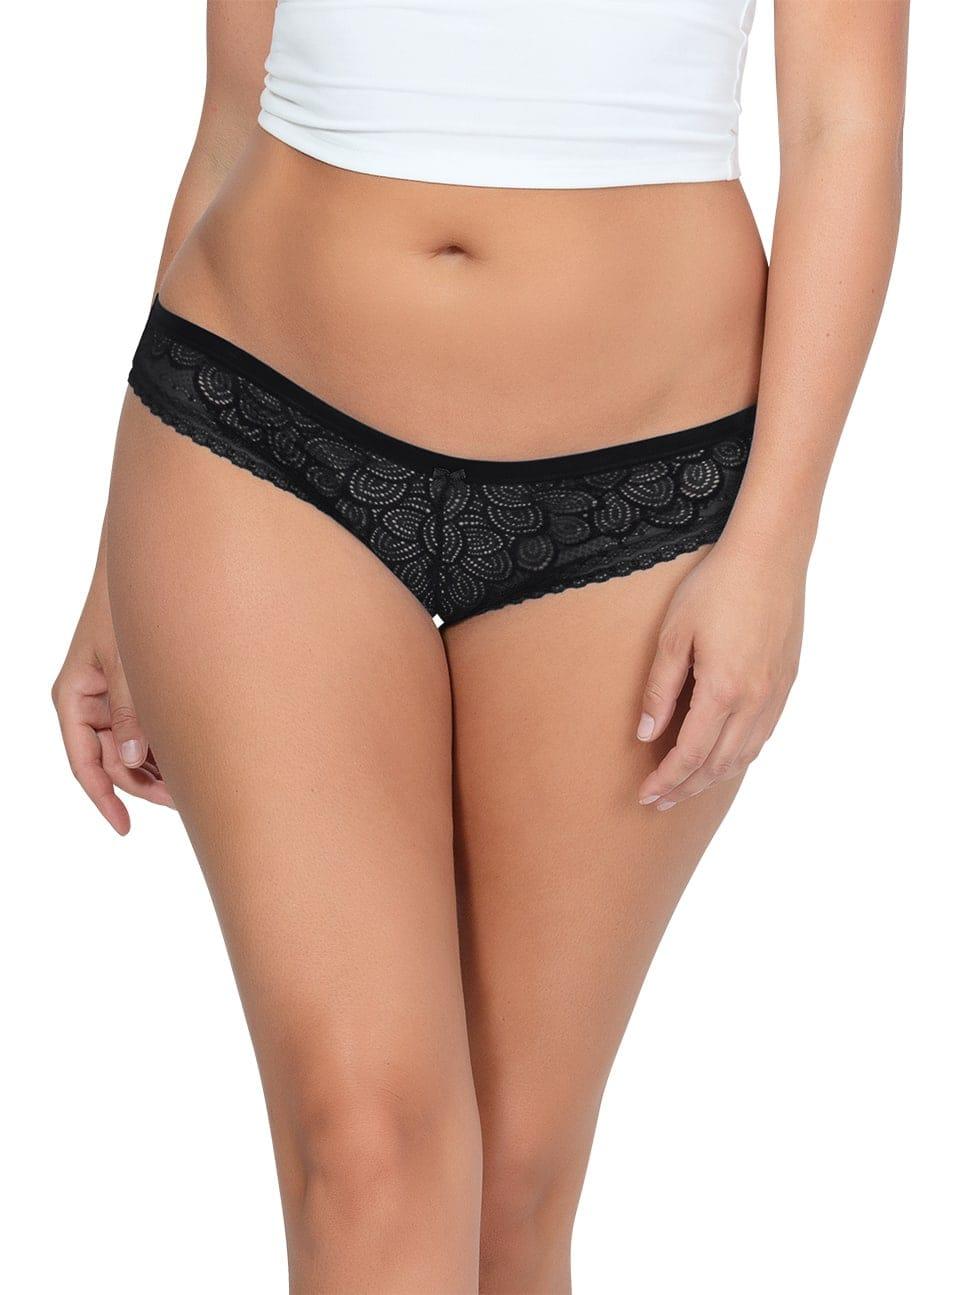 ParfaitPanty SoGlam BikiniPP302 Black front - Parfait Panty So Glam Bikini - Black - PP302